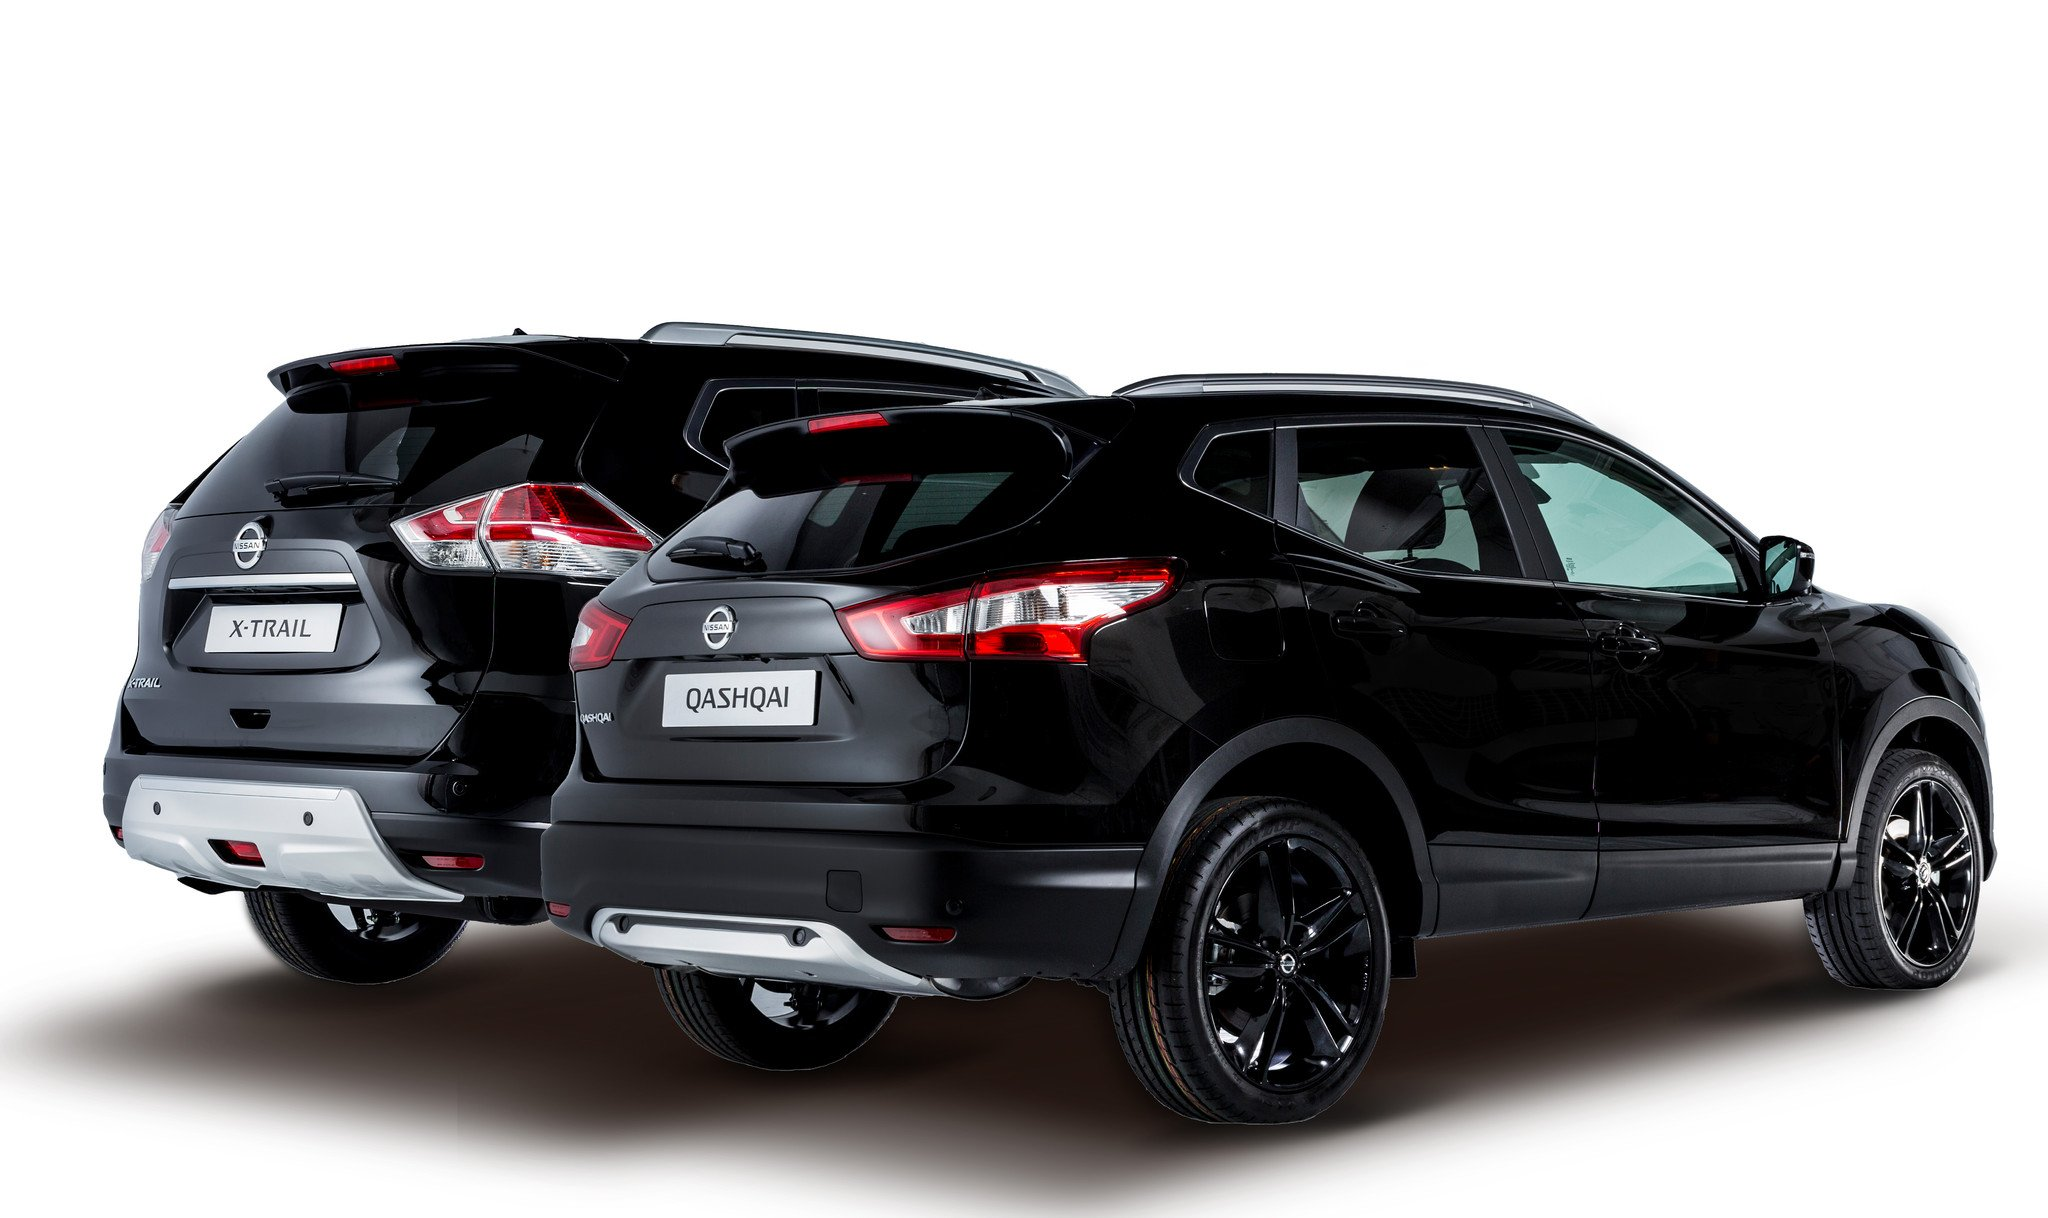 Nissan X-trail y Qashqai Black Edition: 300 unidades más equipadas 2